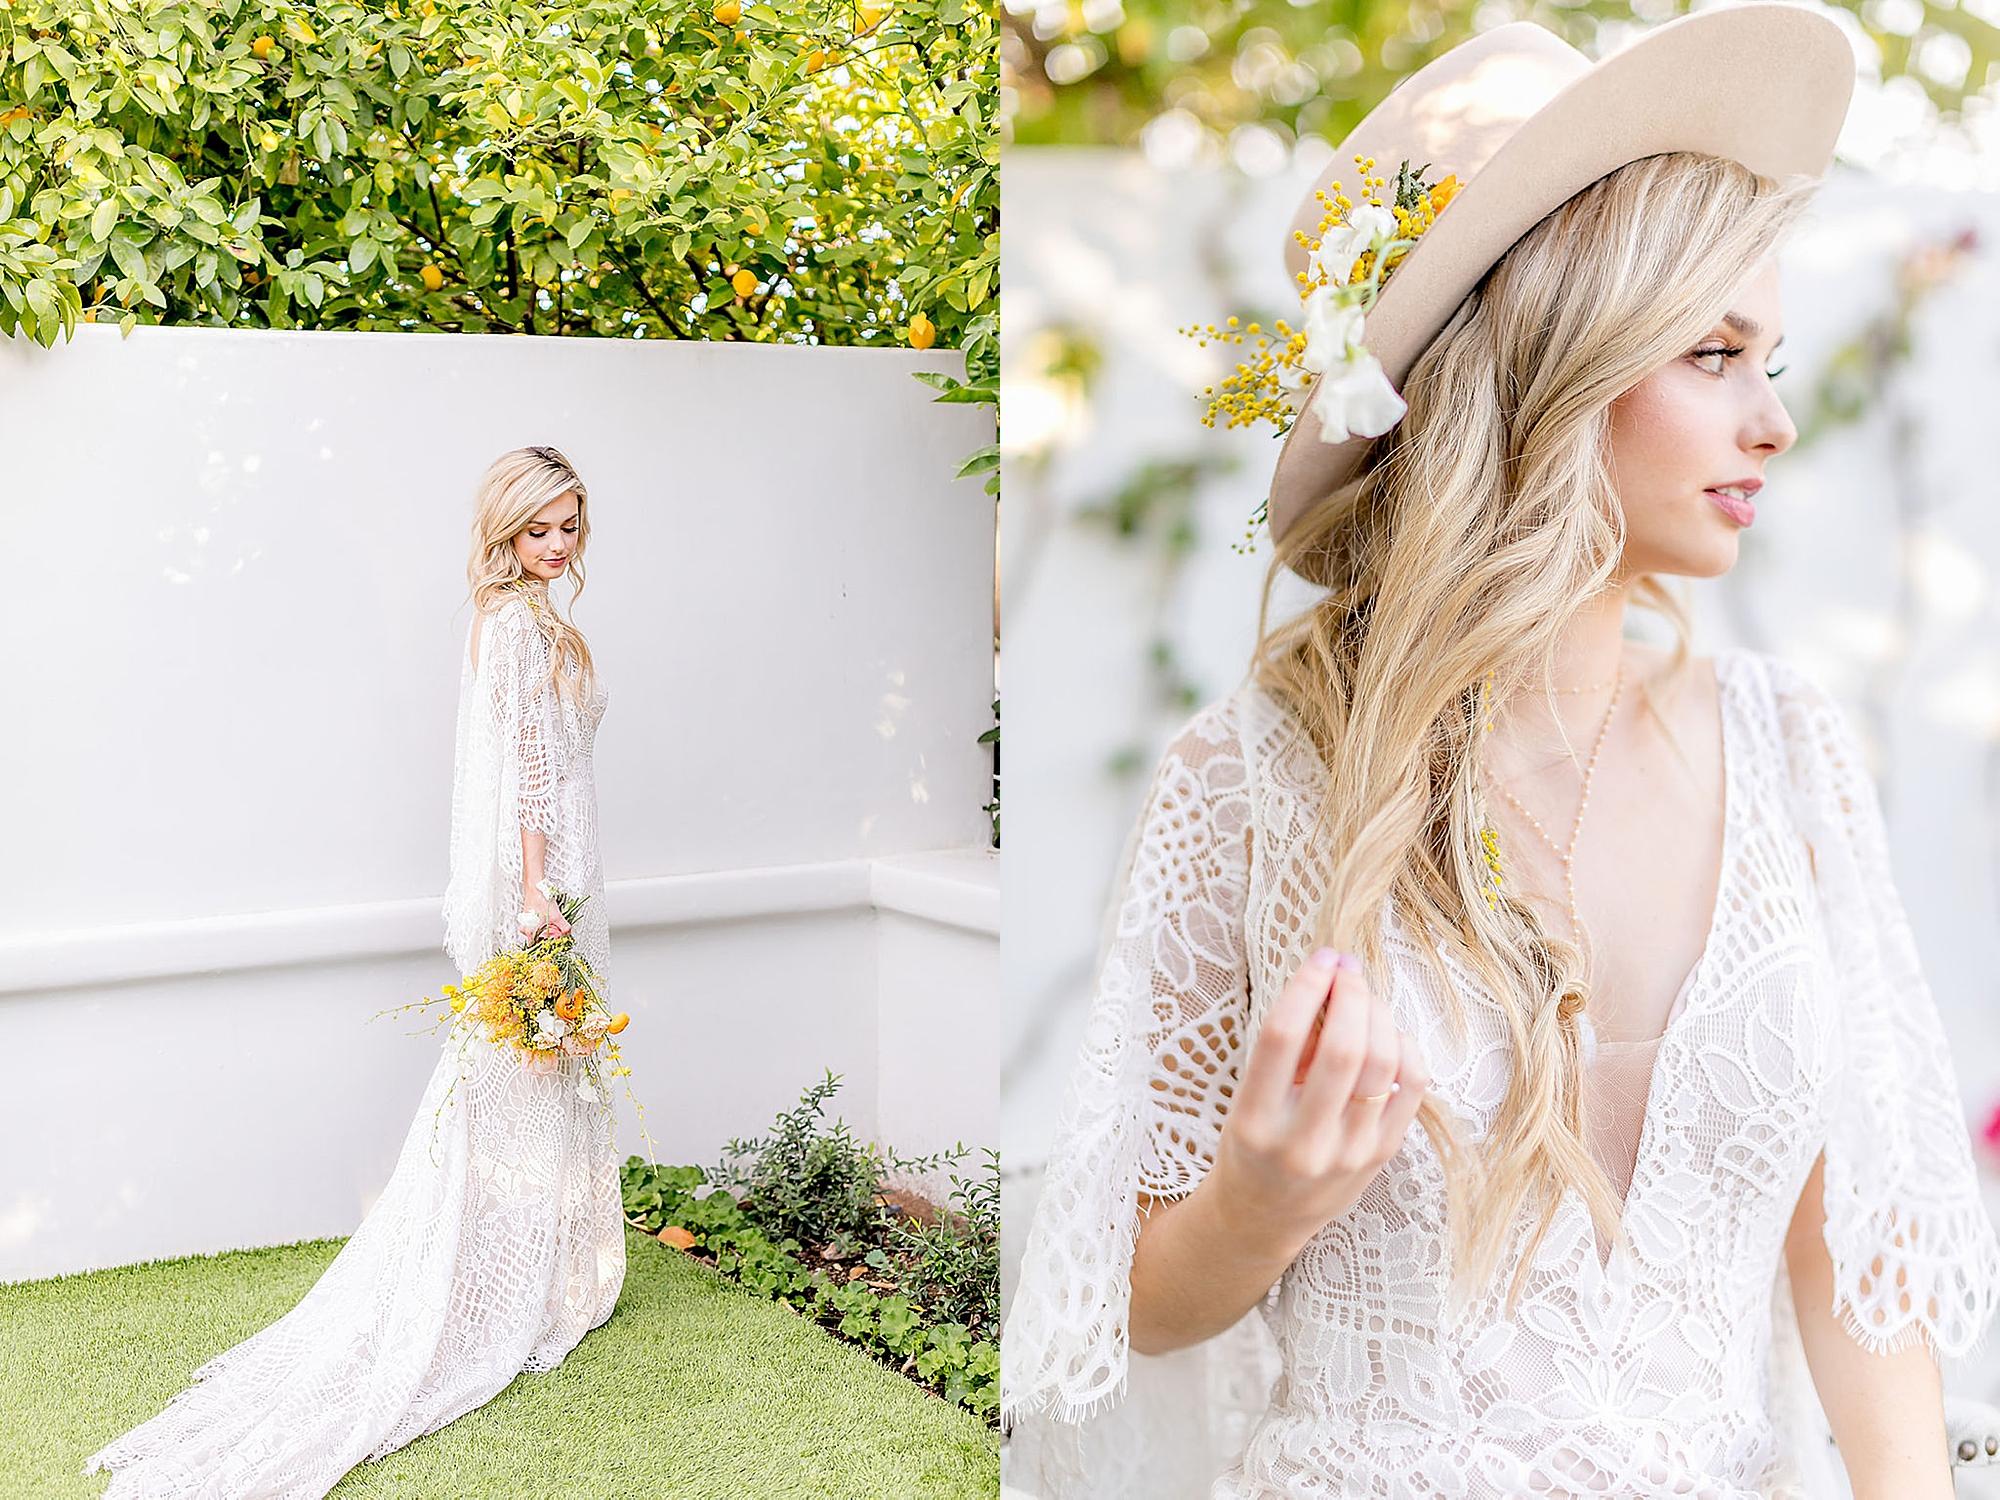 El Chorro Sedona AZ Wedding Photography by Magi Fisher of Magdalena Studios 0006